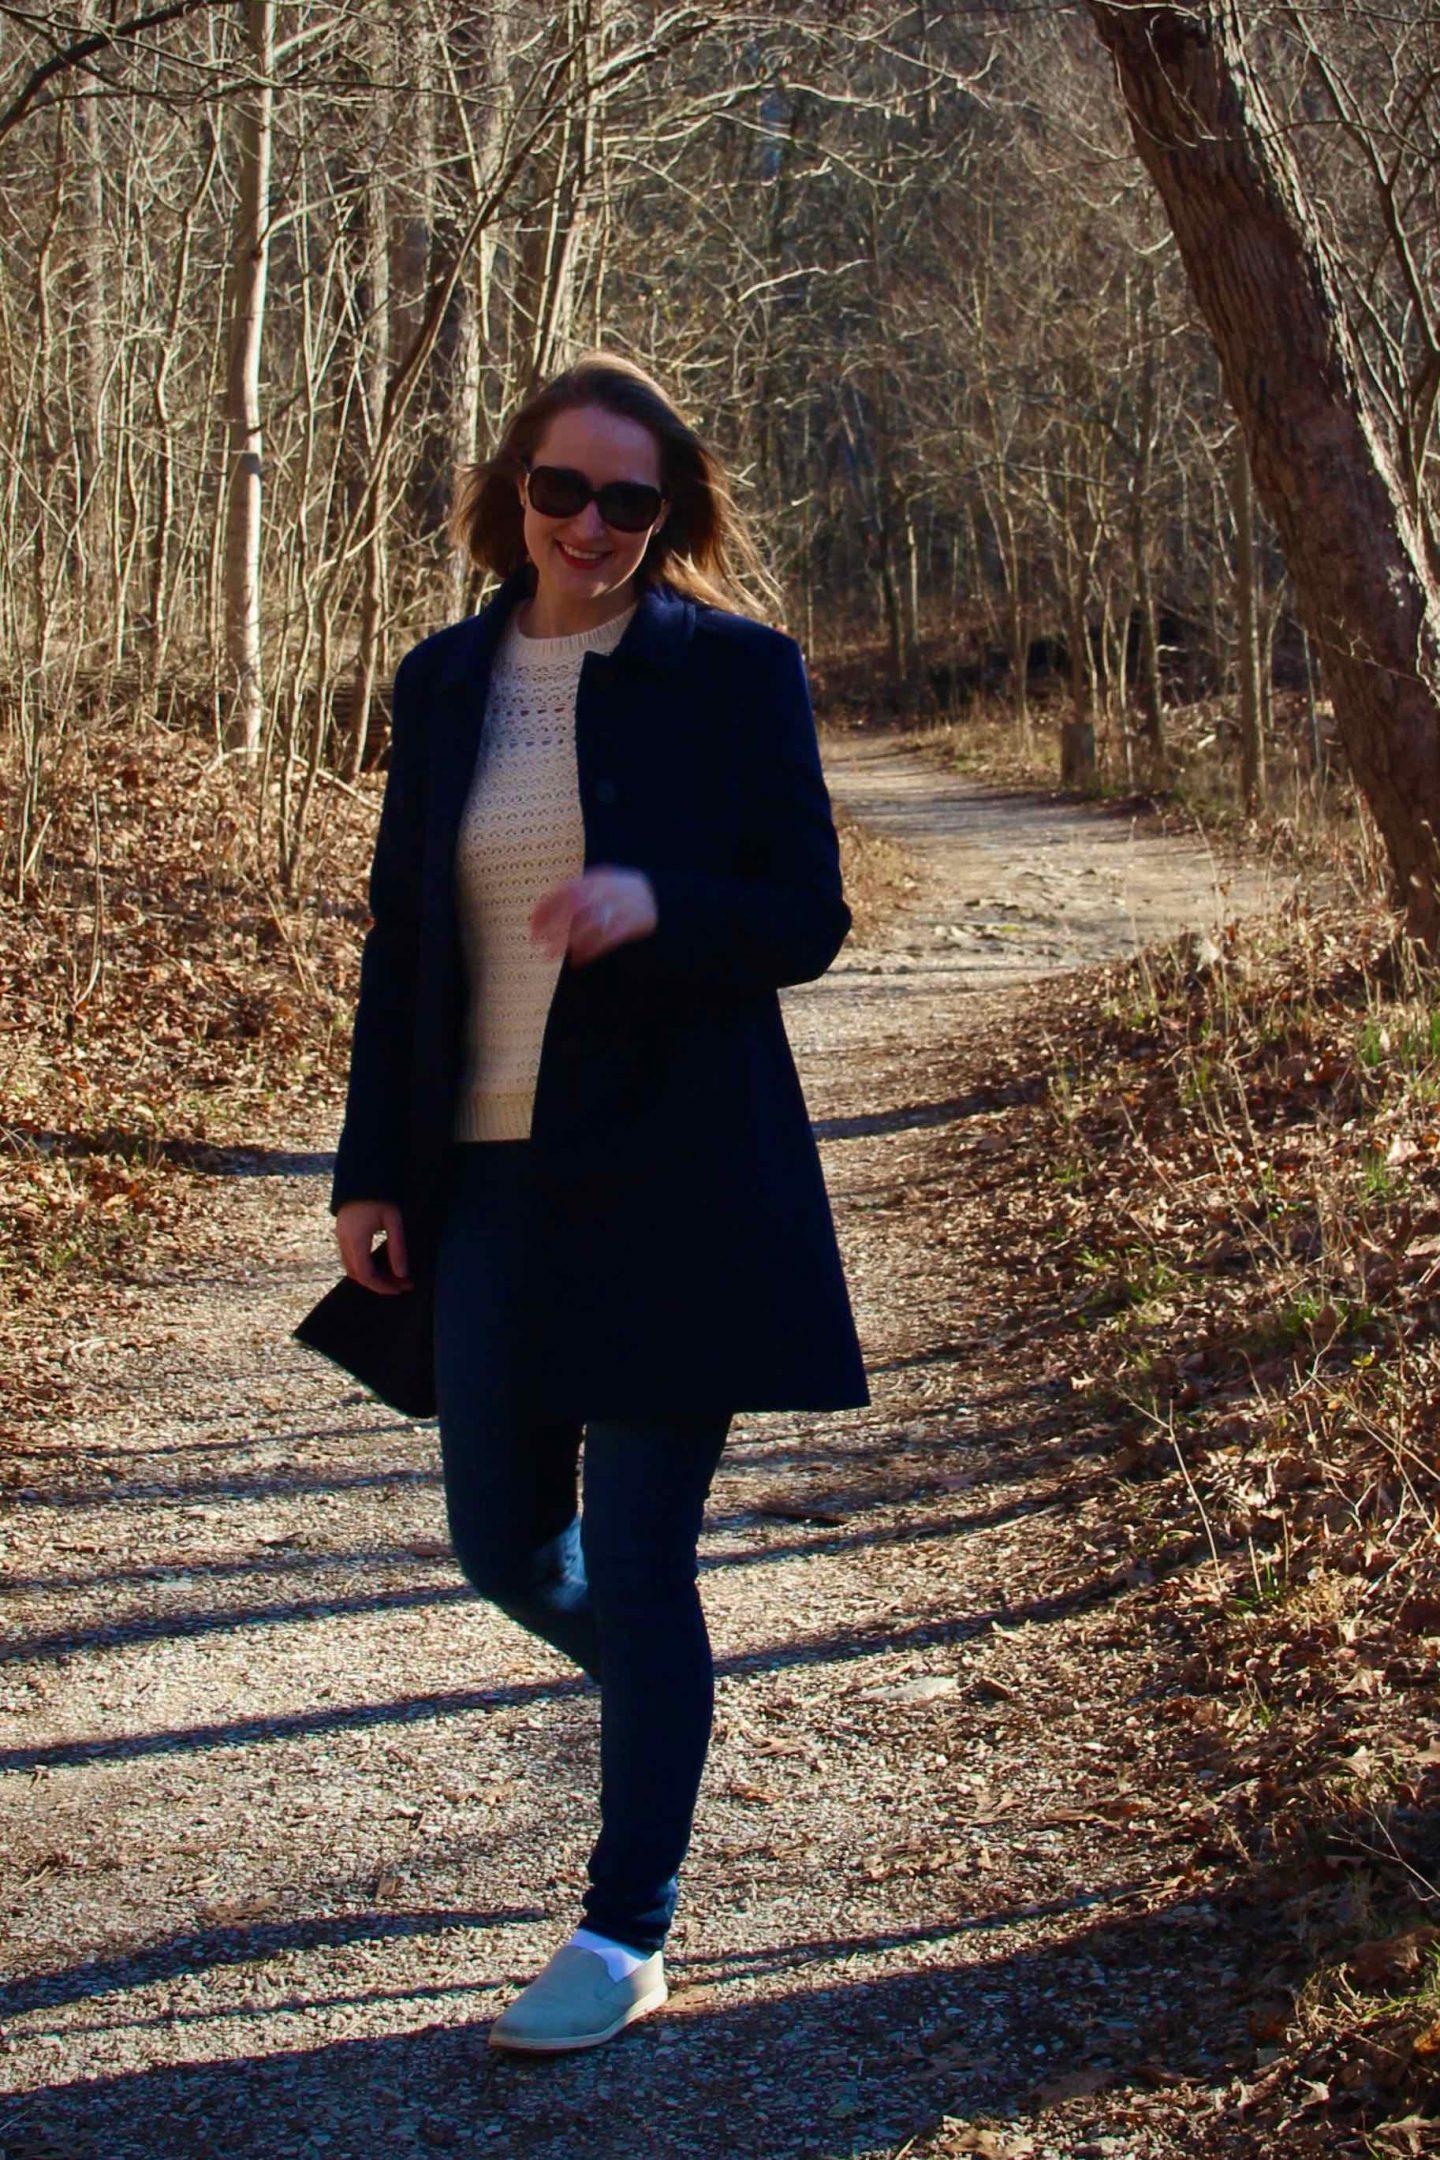 Preppy Winter Coat & Fair Isle Sweater | Walks through Sharon Woods | The Spectacular Adventurer